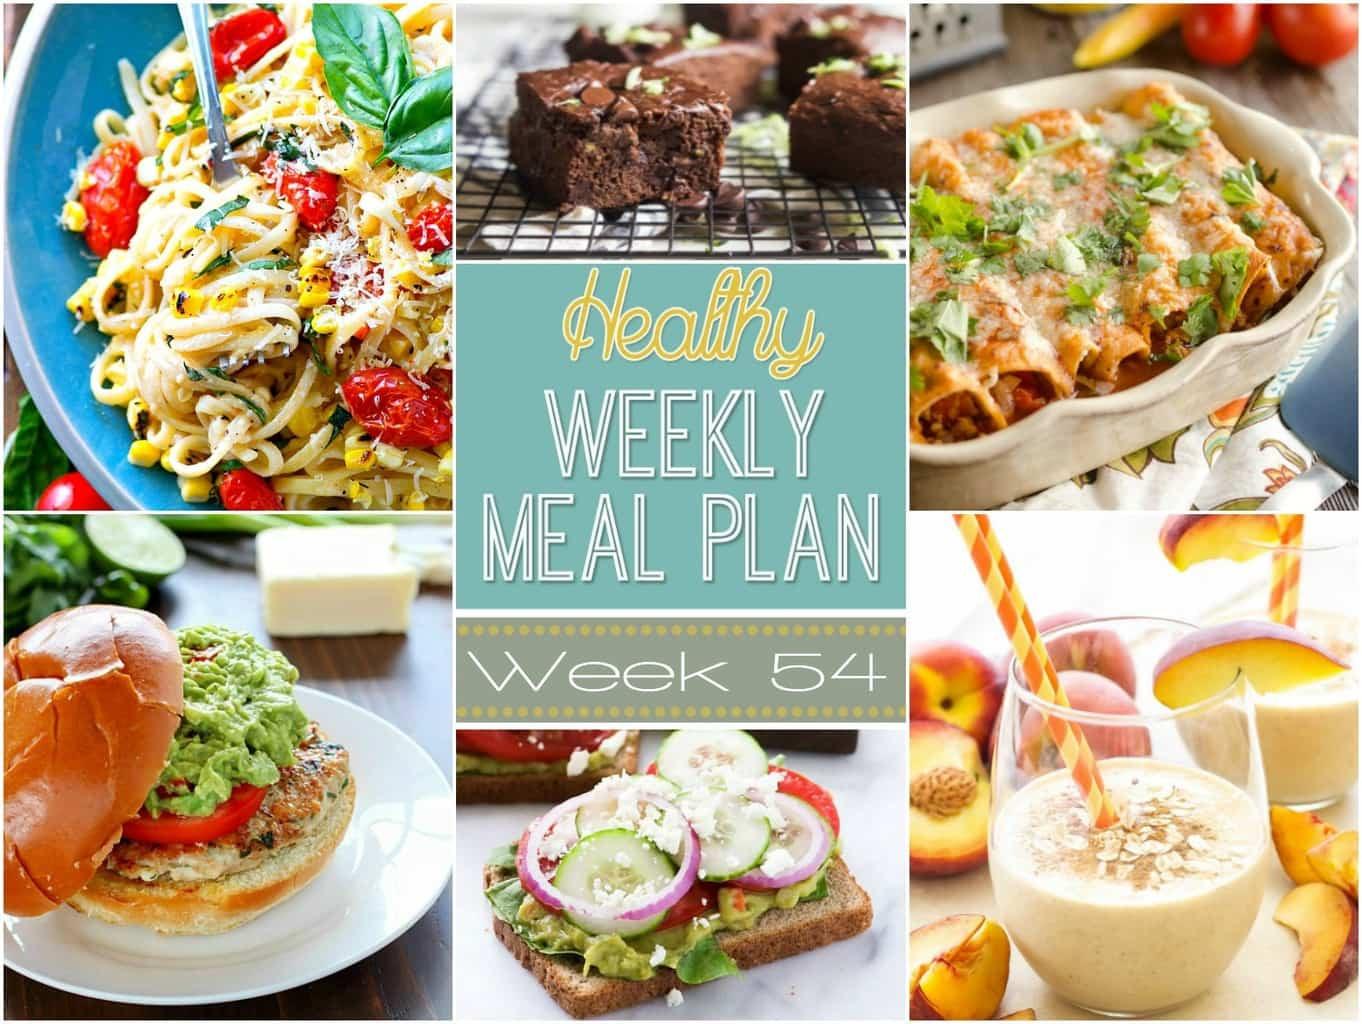 Healthy Breakfast For A Week  Healthy Weekly Meal Plan 54 Yummy Healthy Easy